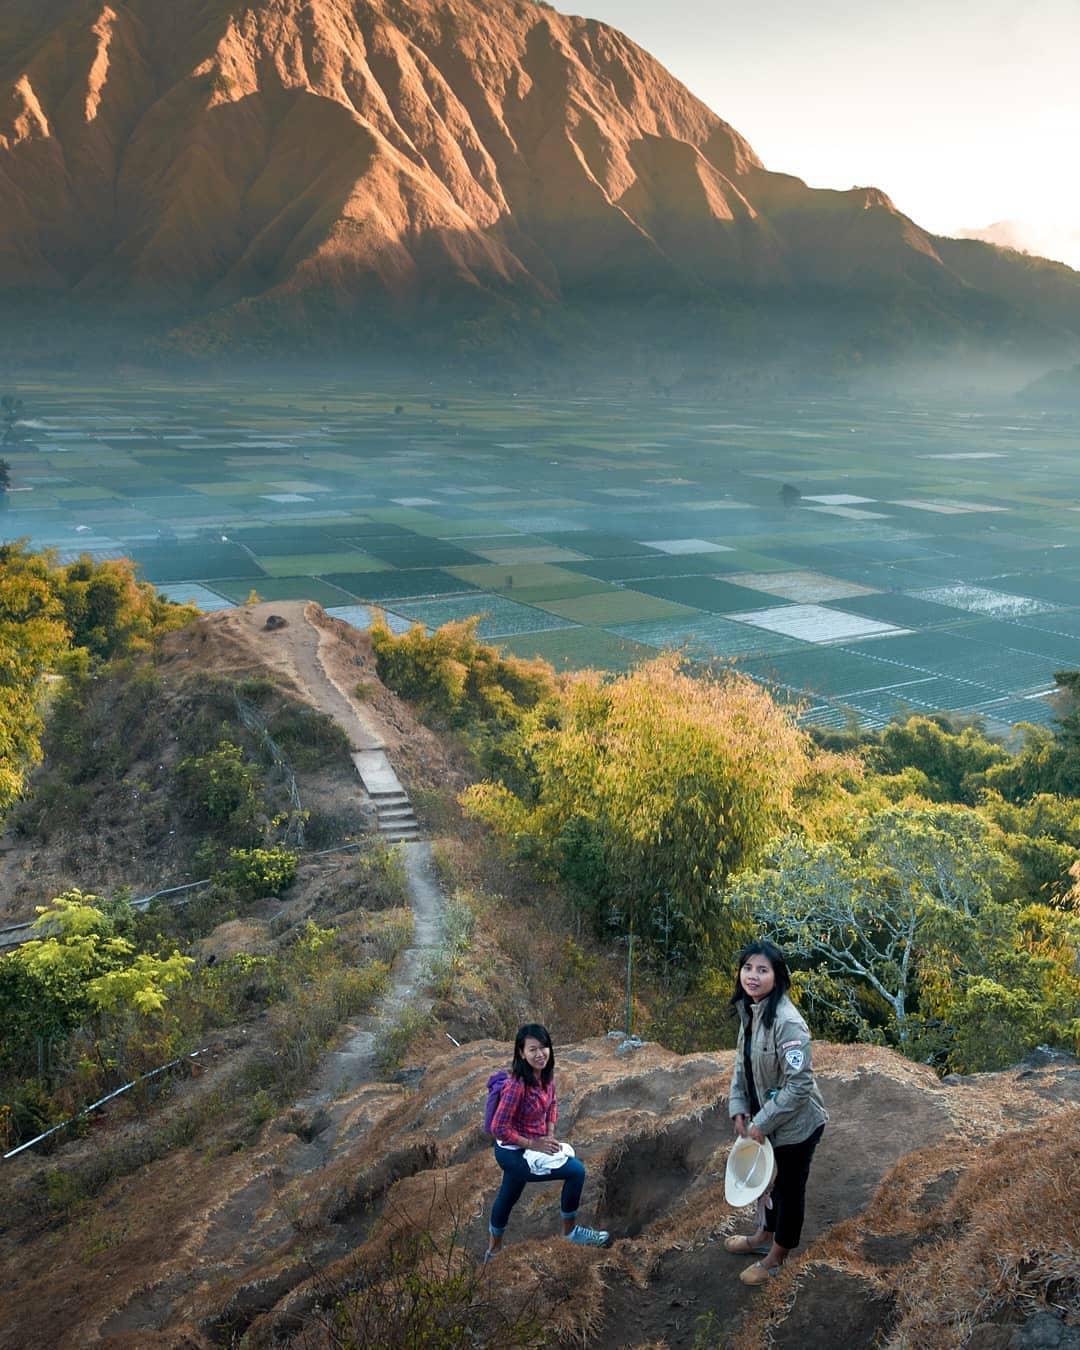 Bukit Selong Tempat Wisata Lombok 2021 Paling Nyaman untuk Liburan